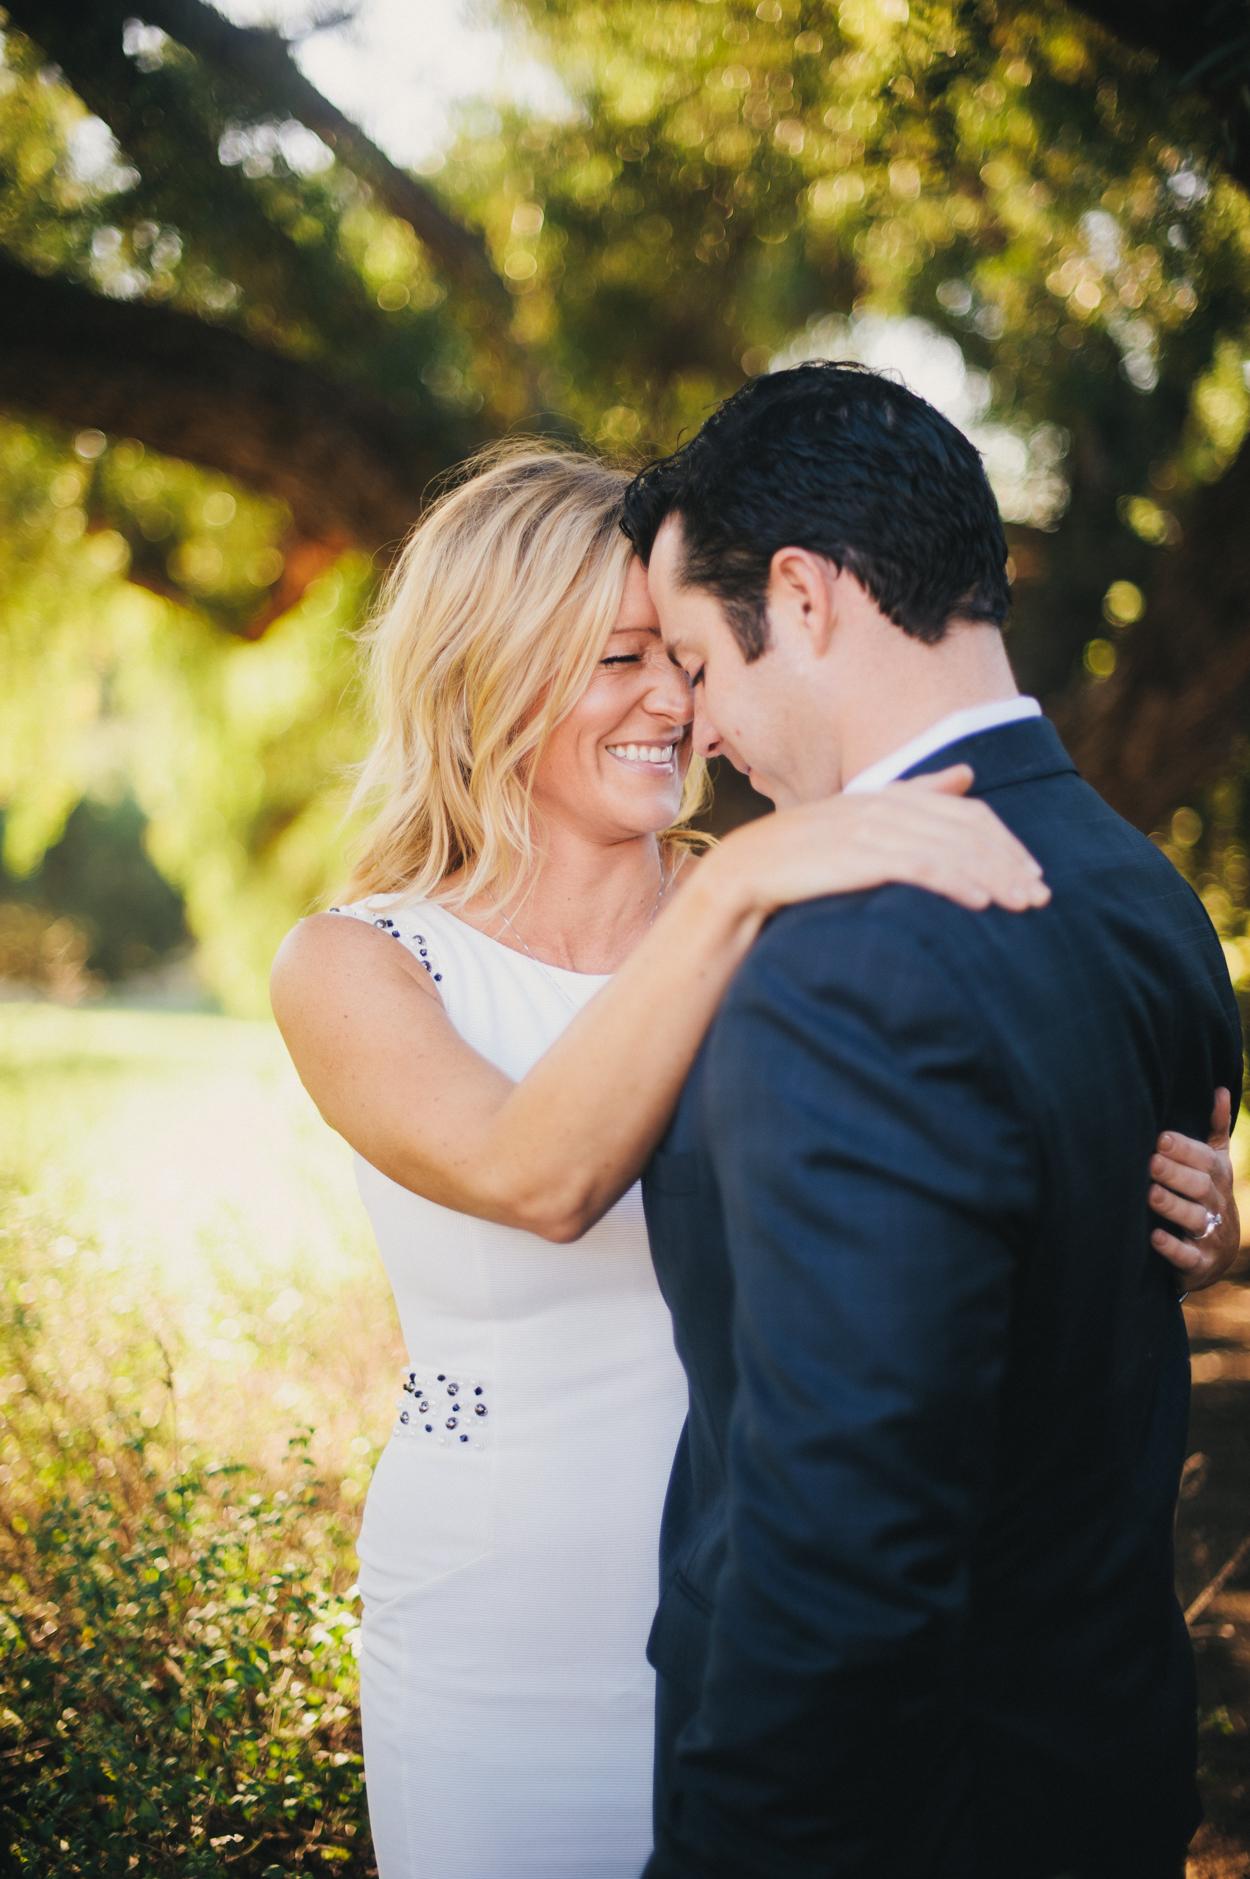 temecula_wedding_photographer0015.jpg